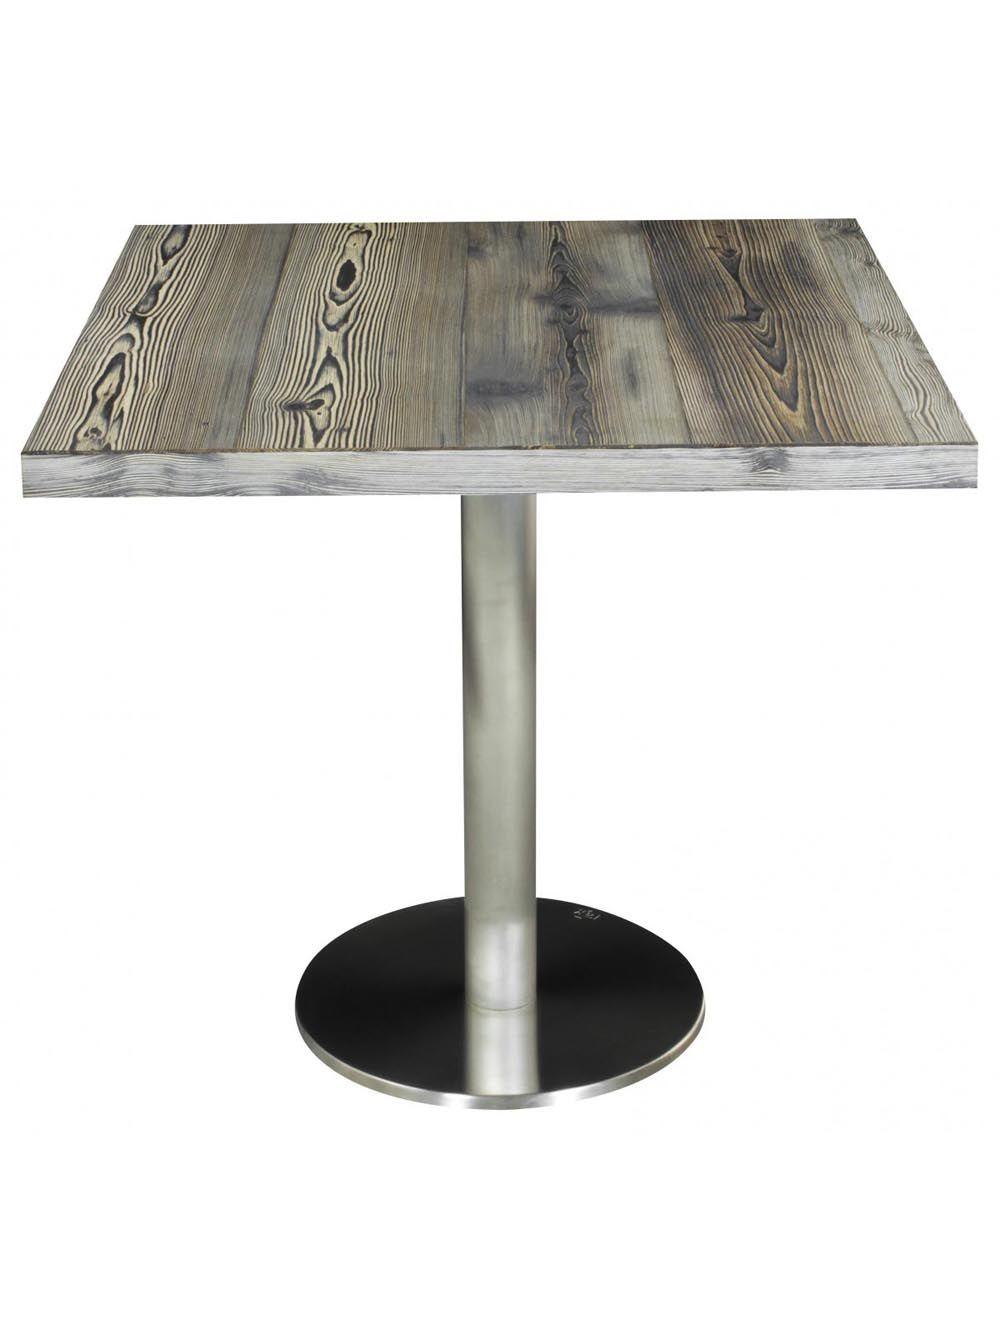 Mesa 25 by rak mobiliario para restaurantes for Mobiliario para restaurante